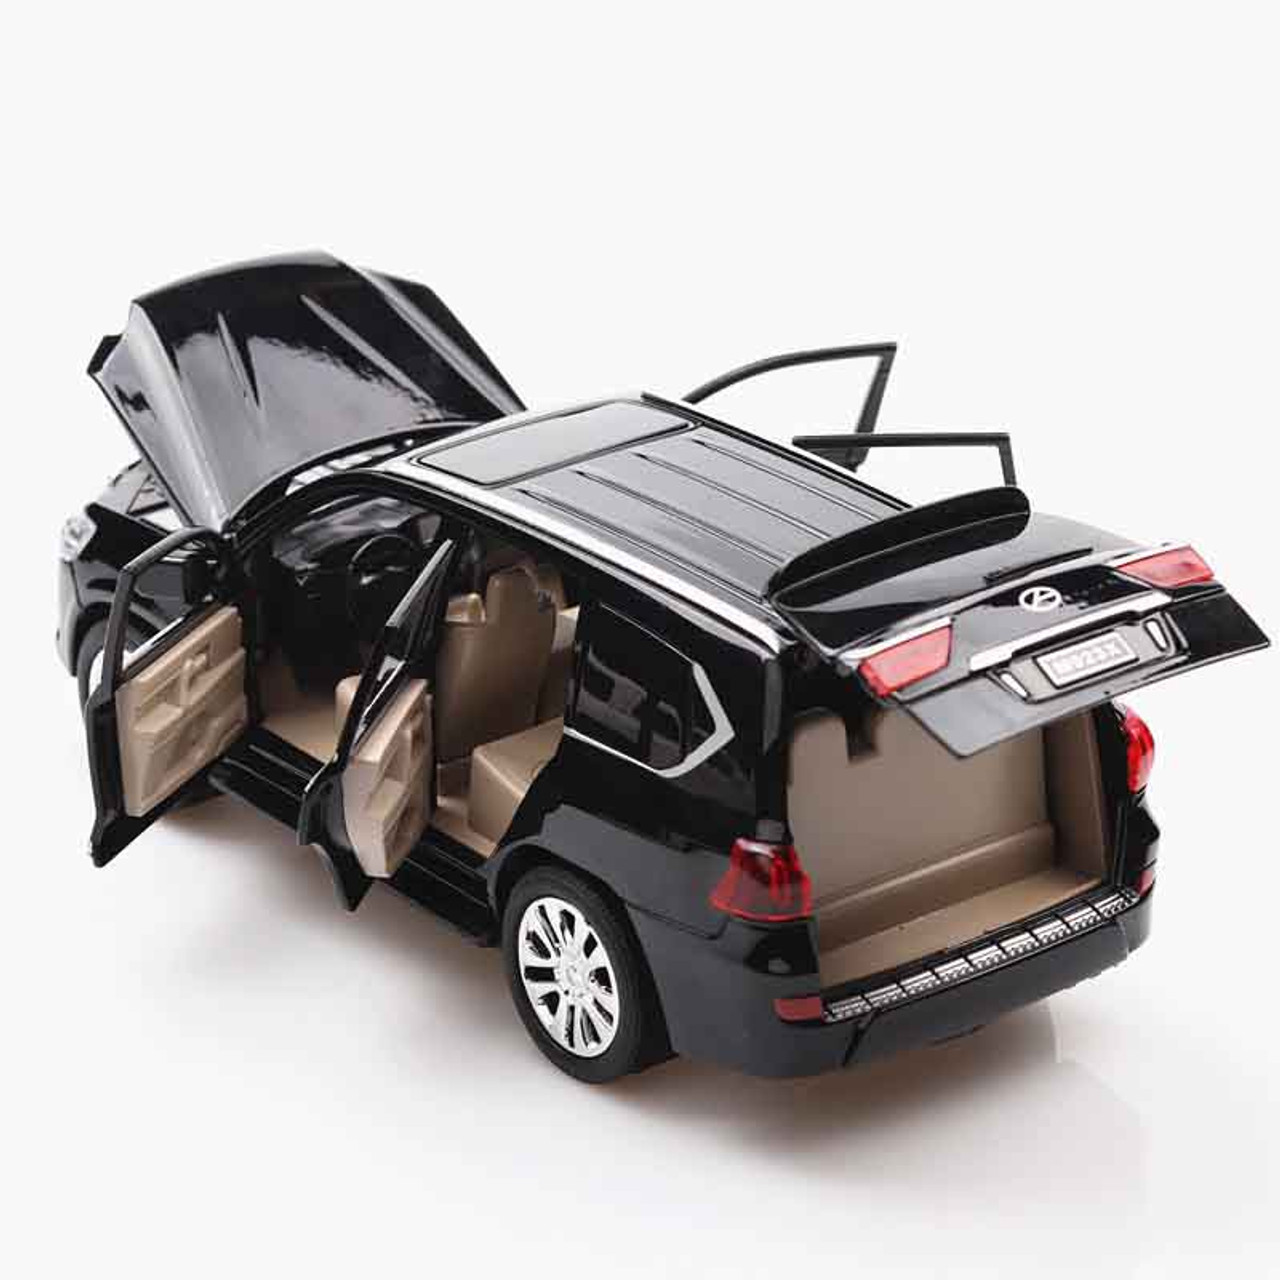 1:24 LX570 Alloy Metal Model Pull Back Toy Cars Light ...